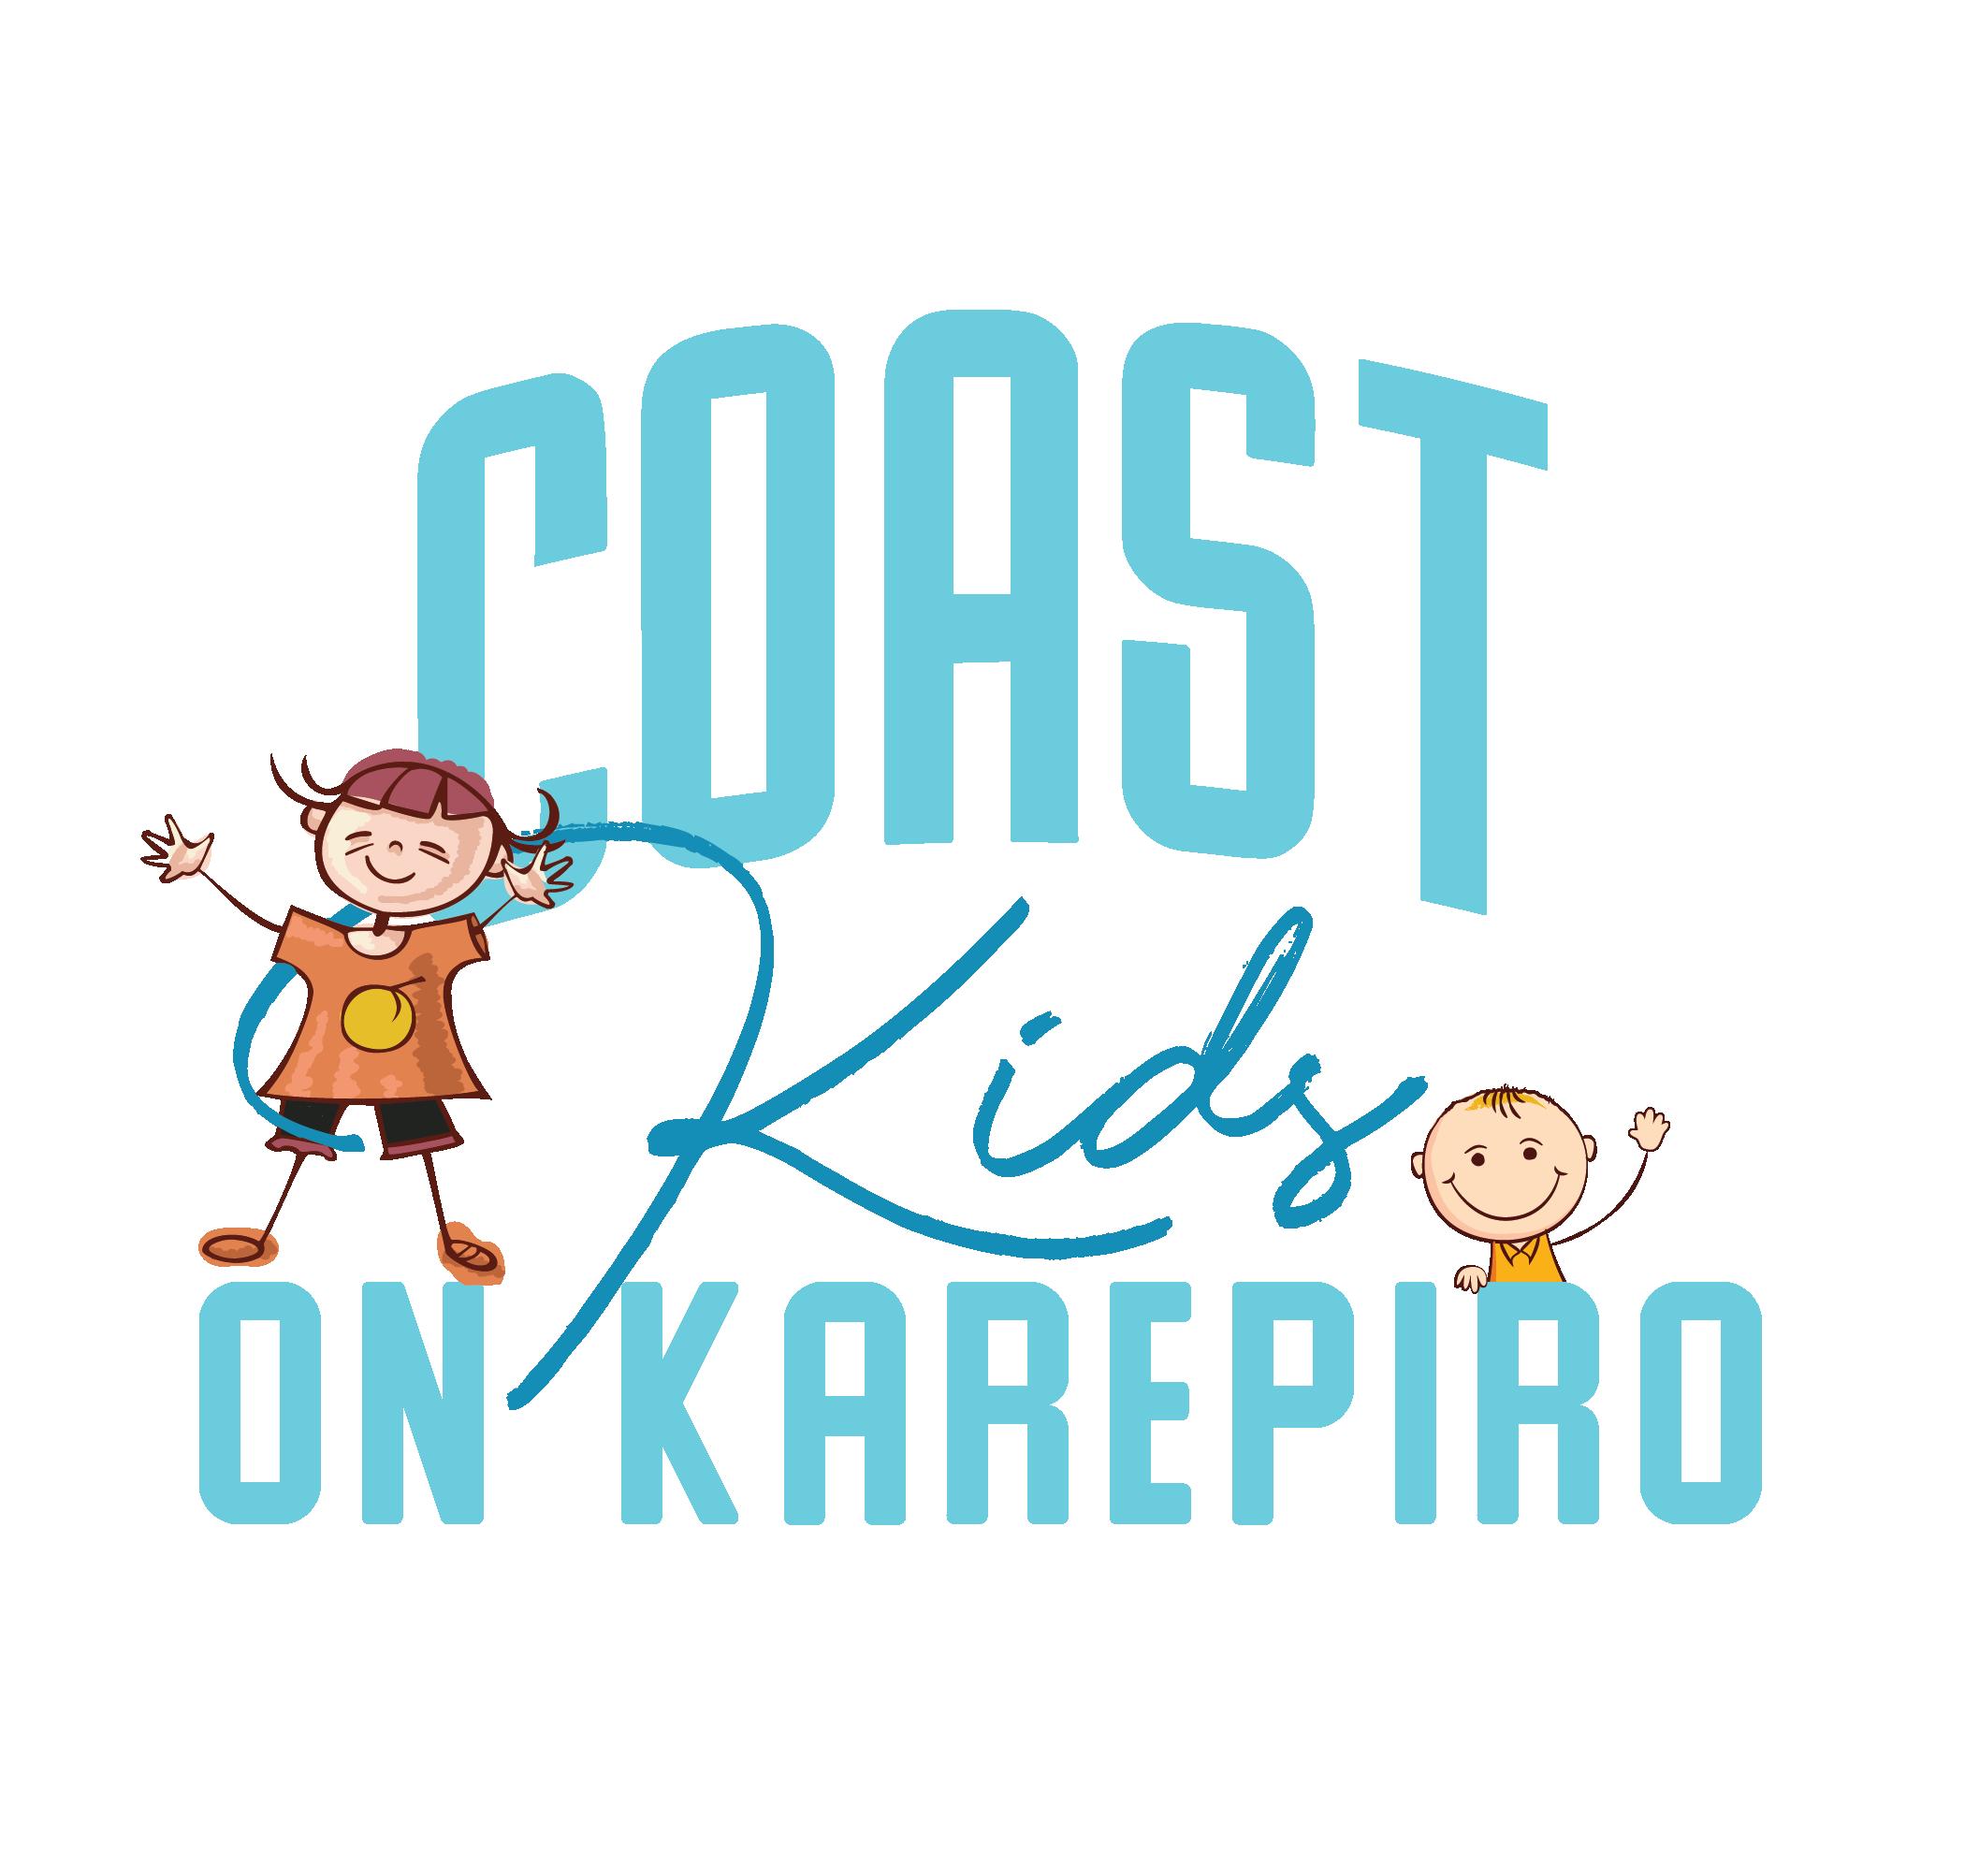 Coast Kids on Karepiro